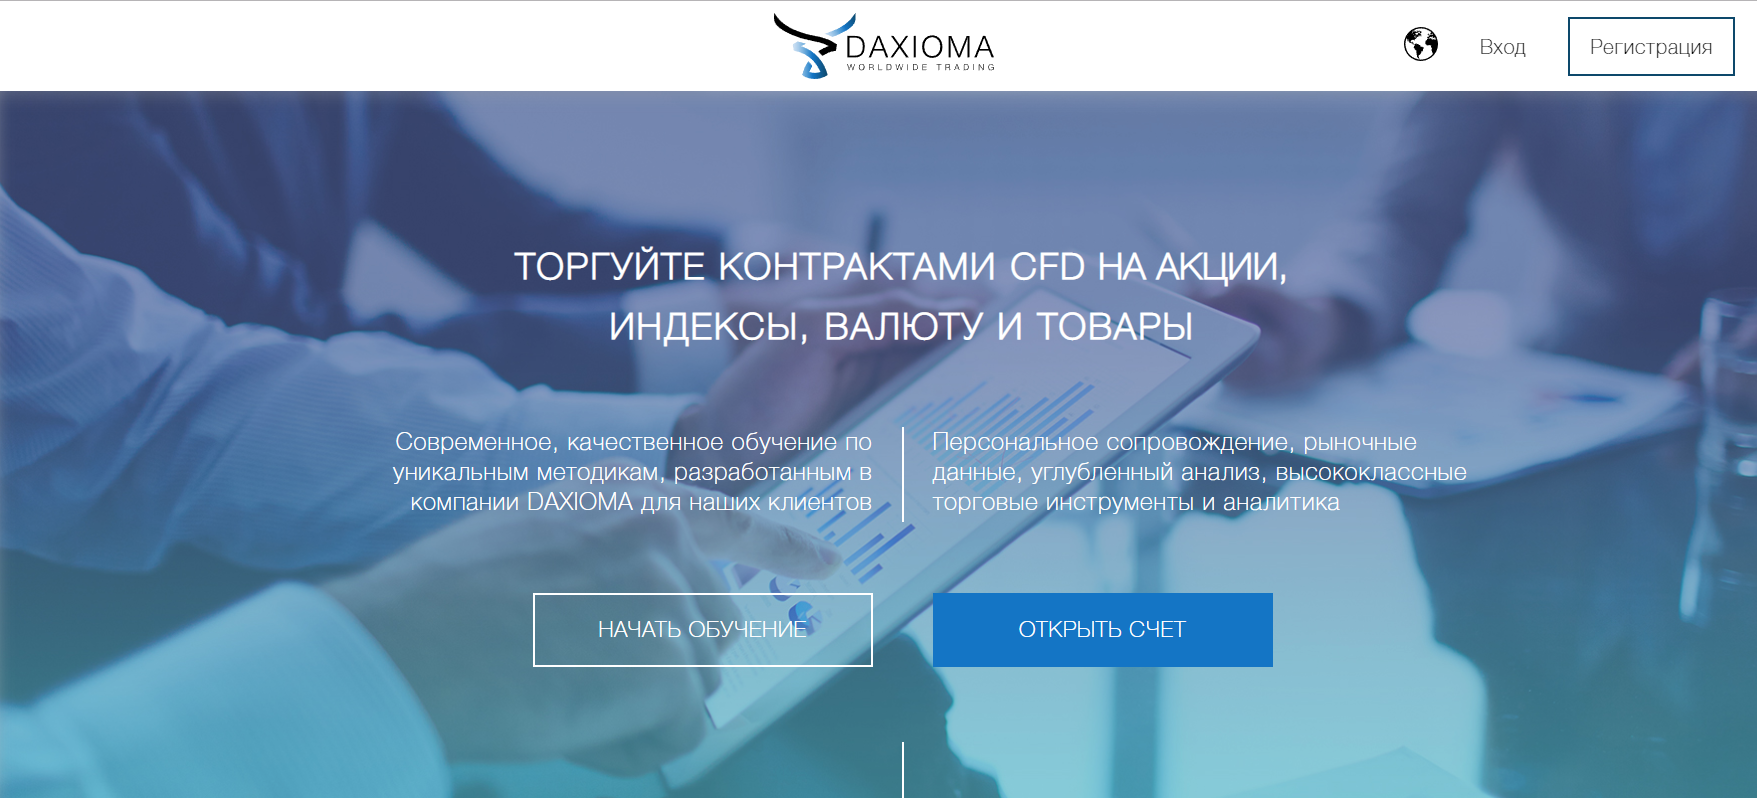 Daxioma — отзывы о брокере Даксиома